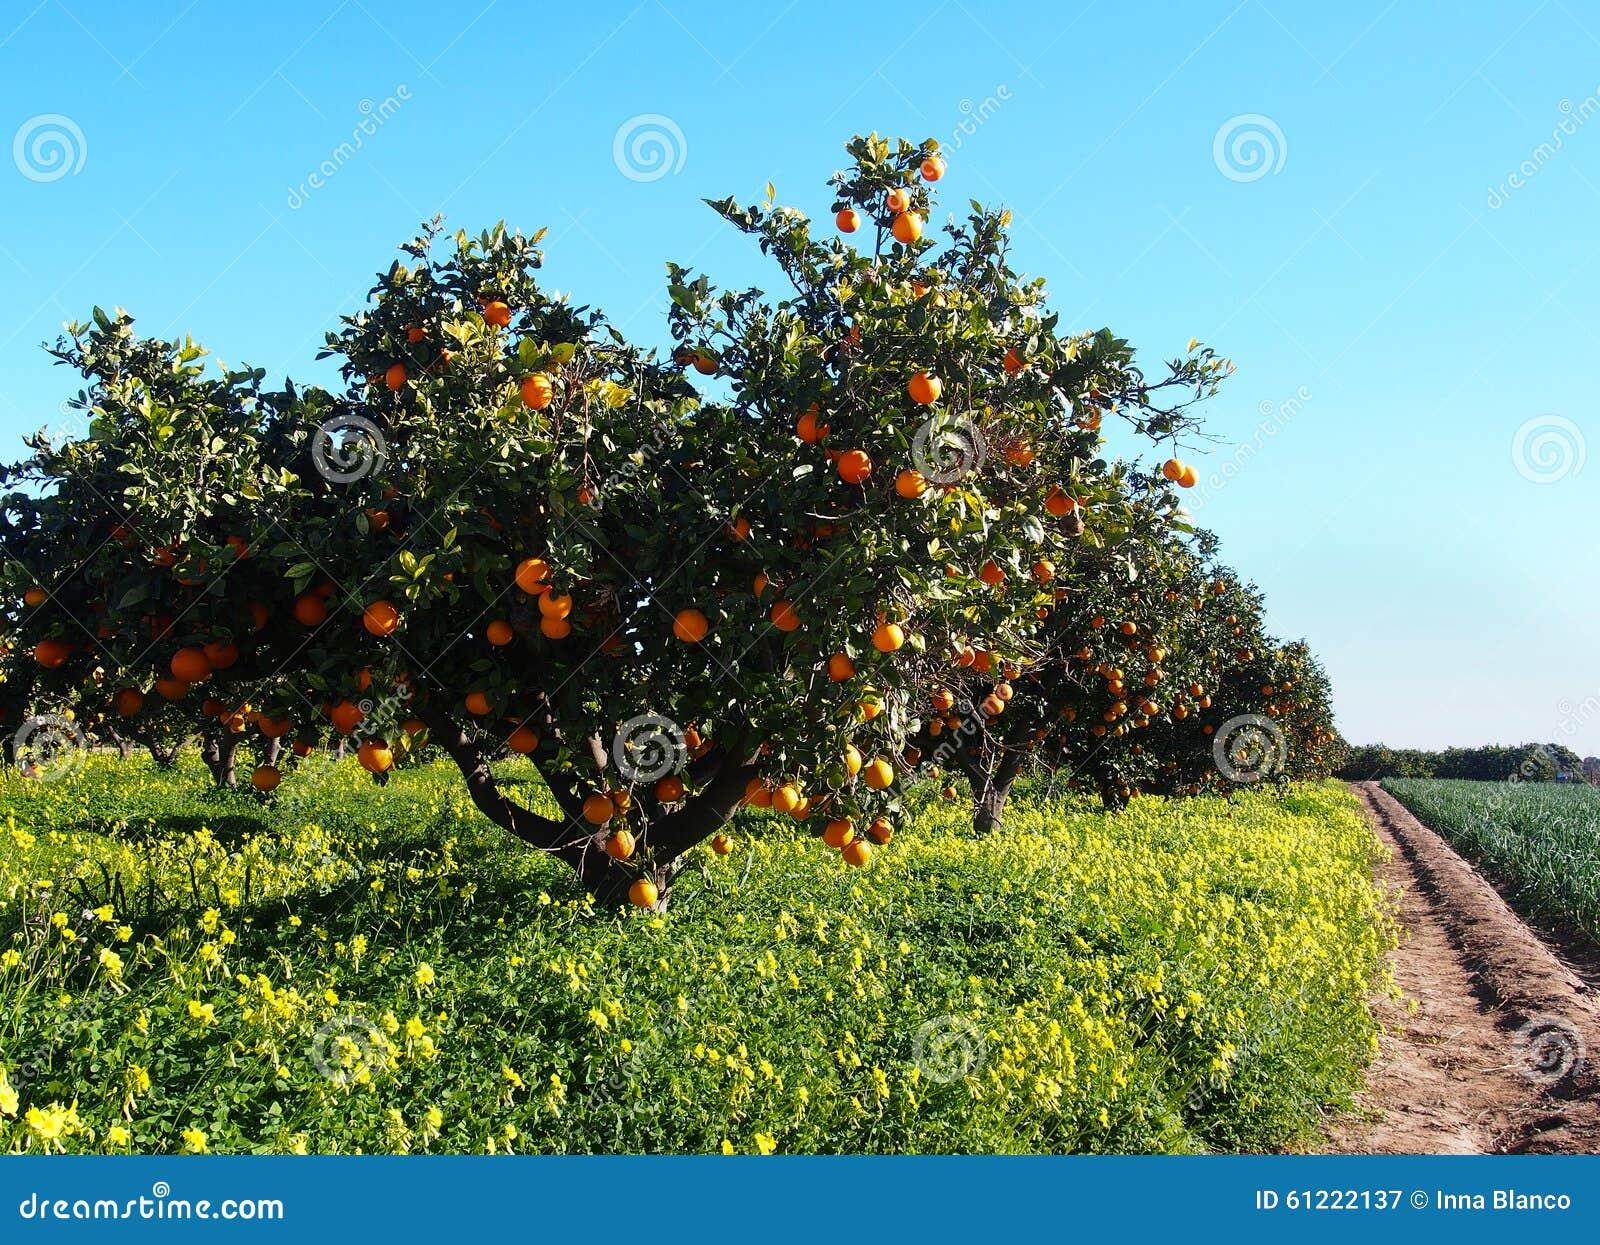 jardin d 39 arbres oranges avec beaucoup de fruits image stock image 61222137. Black Bedroom Furniture Sets. Home Design Ideas